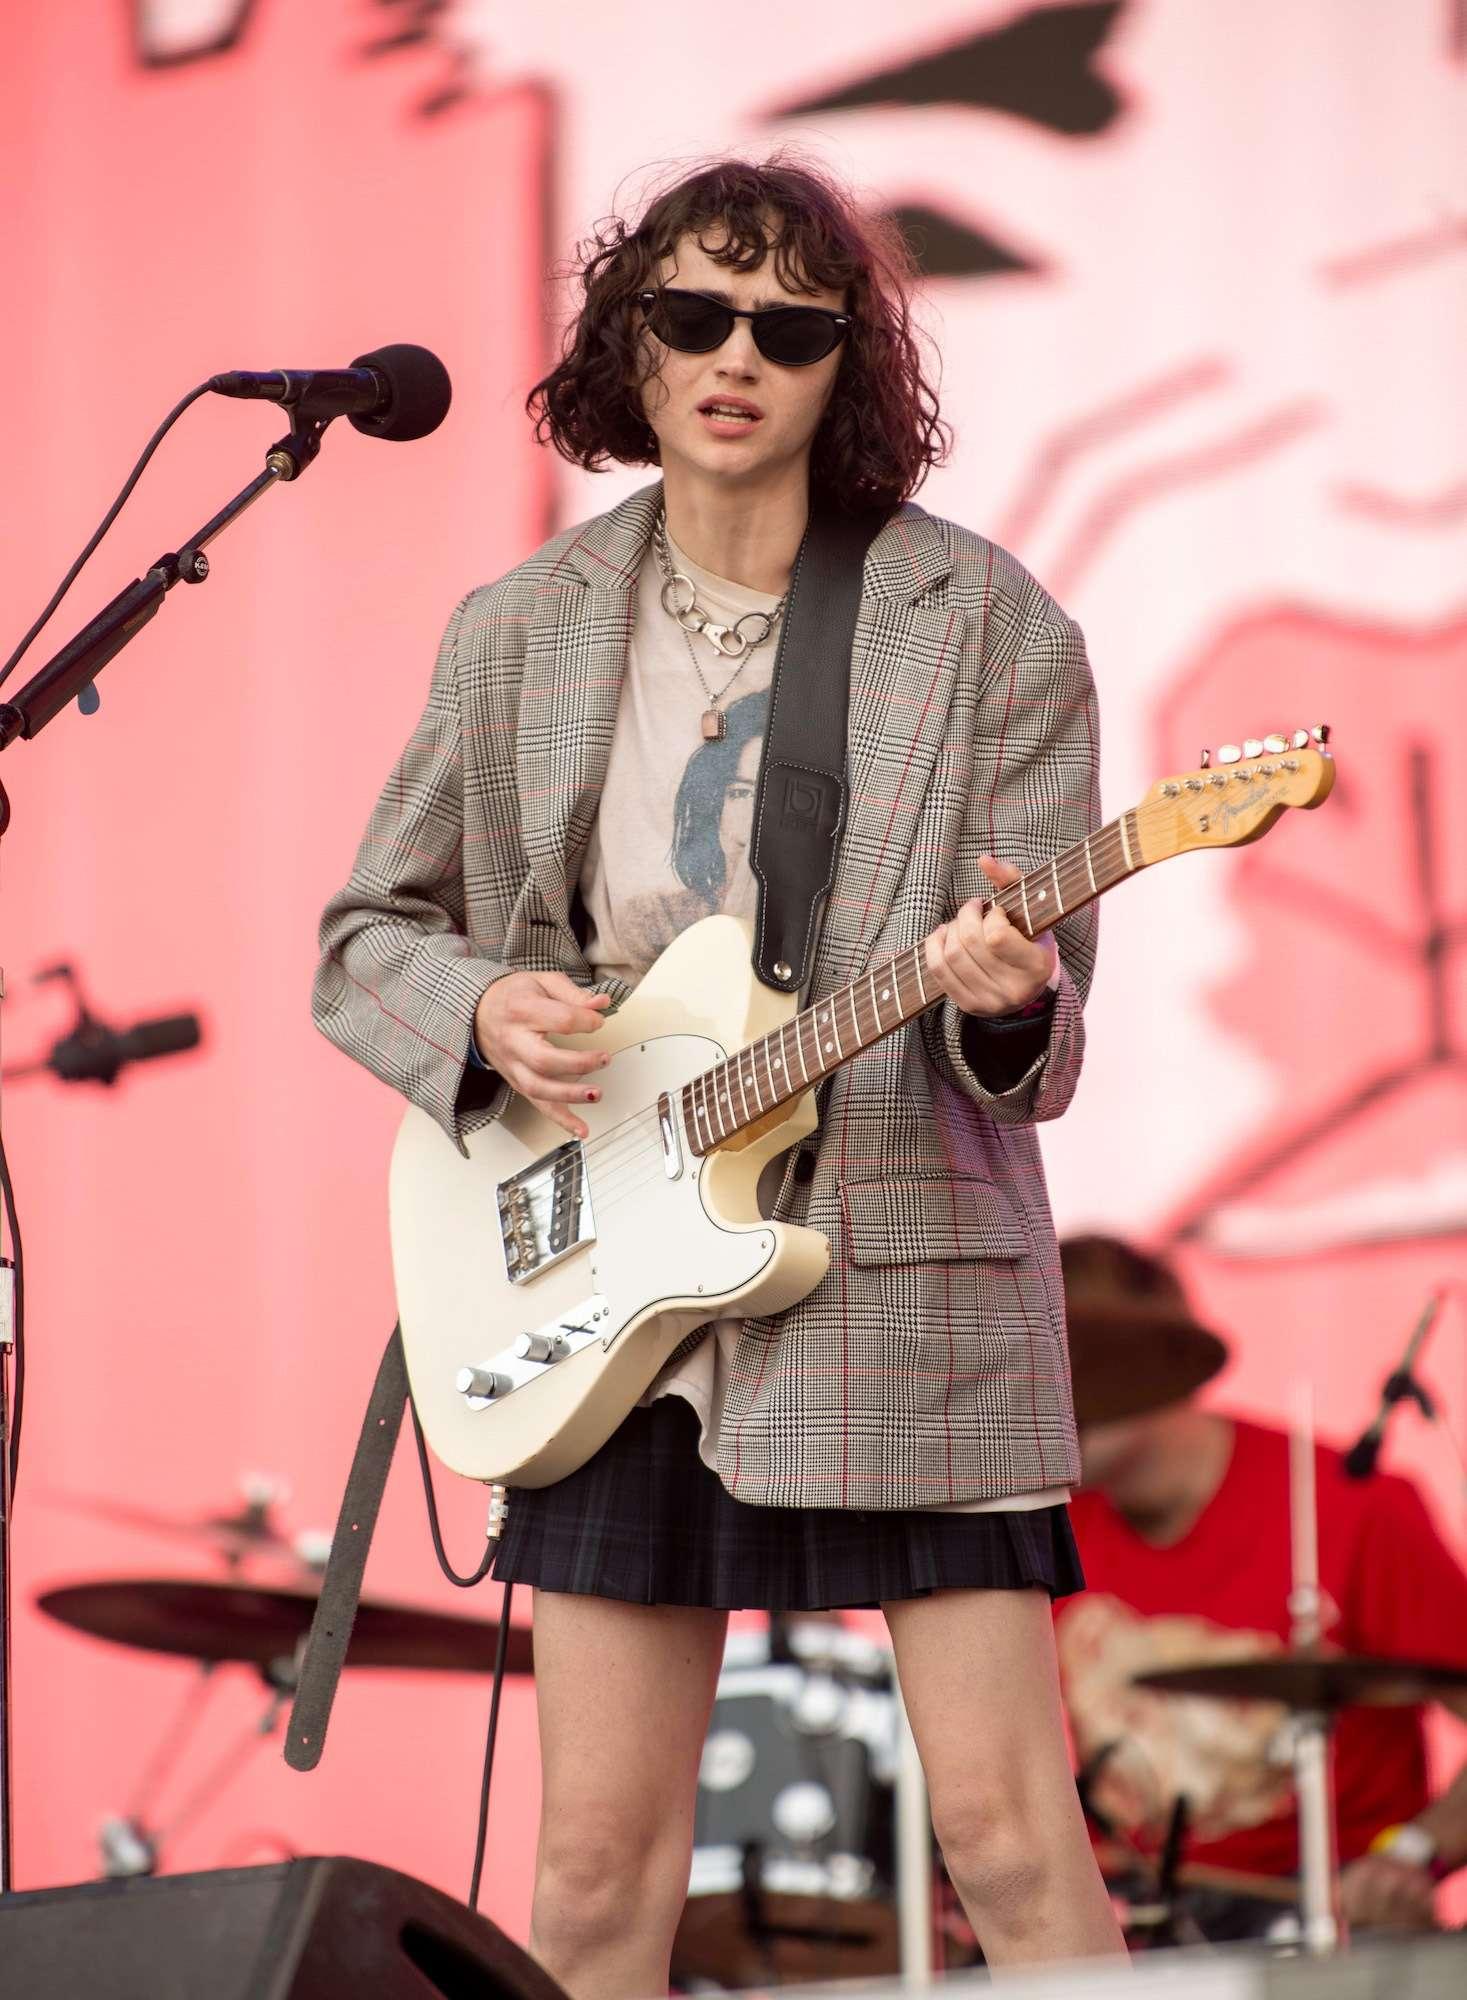 Sir Chloe Live at Lollapalooza [GALLERY] 10